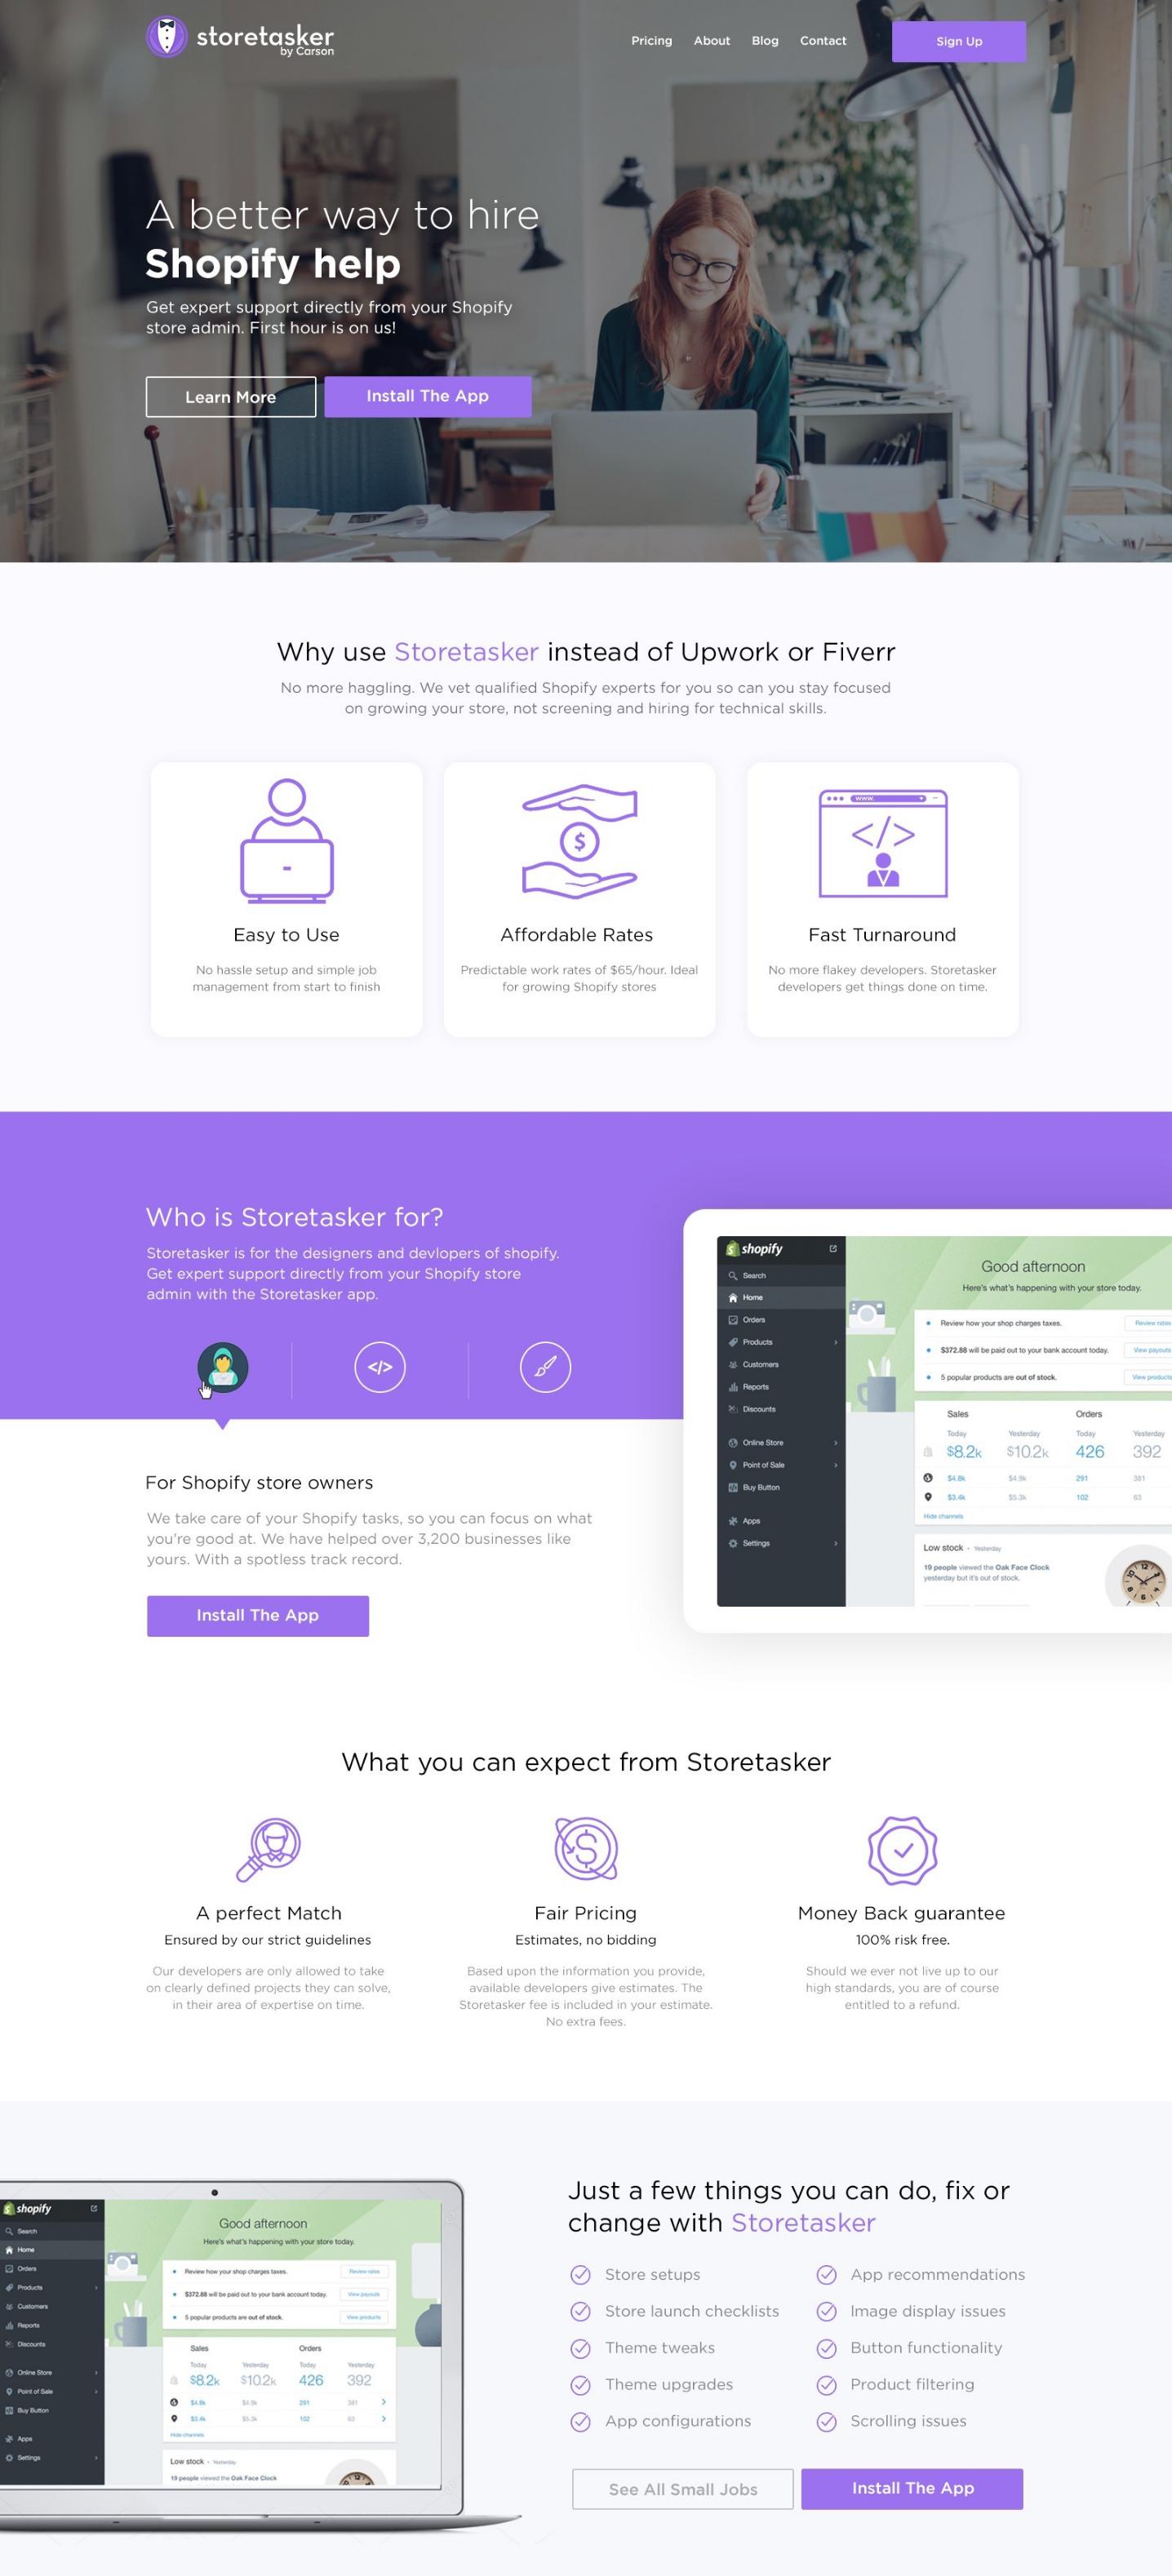 Screenshot of Storetasker's website and services